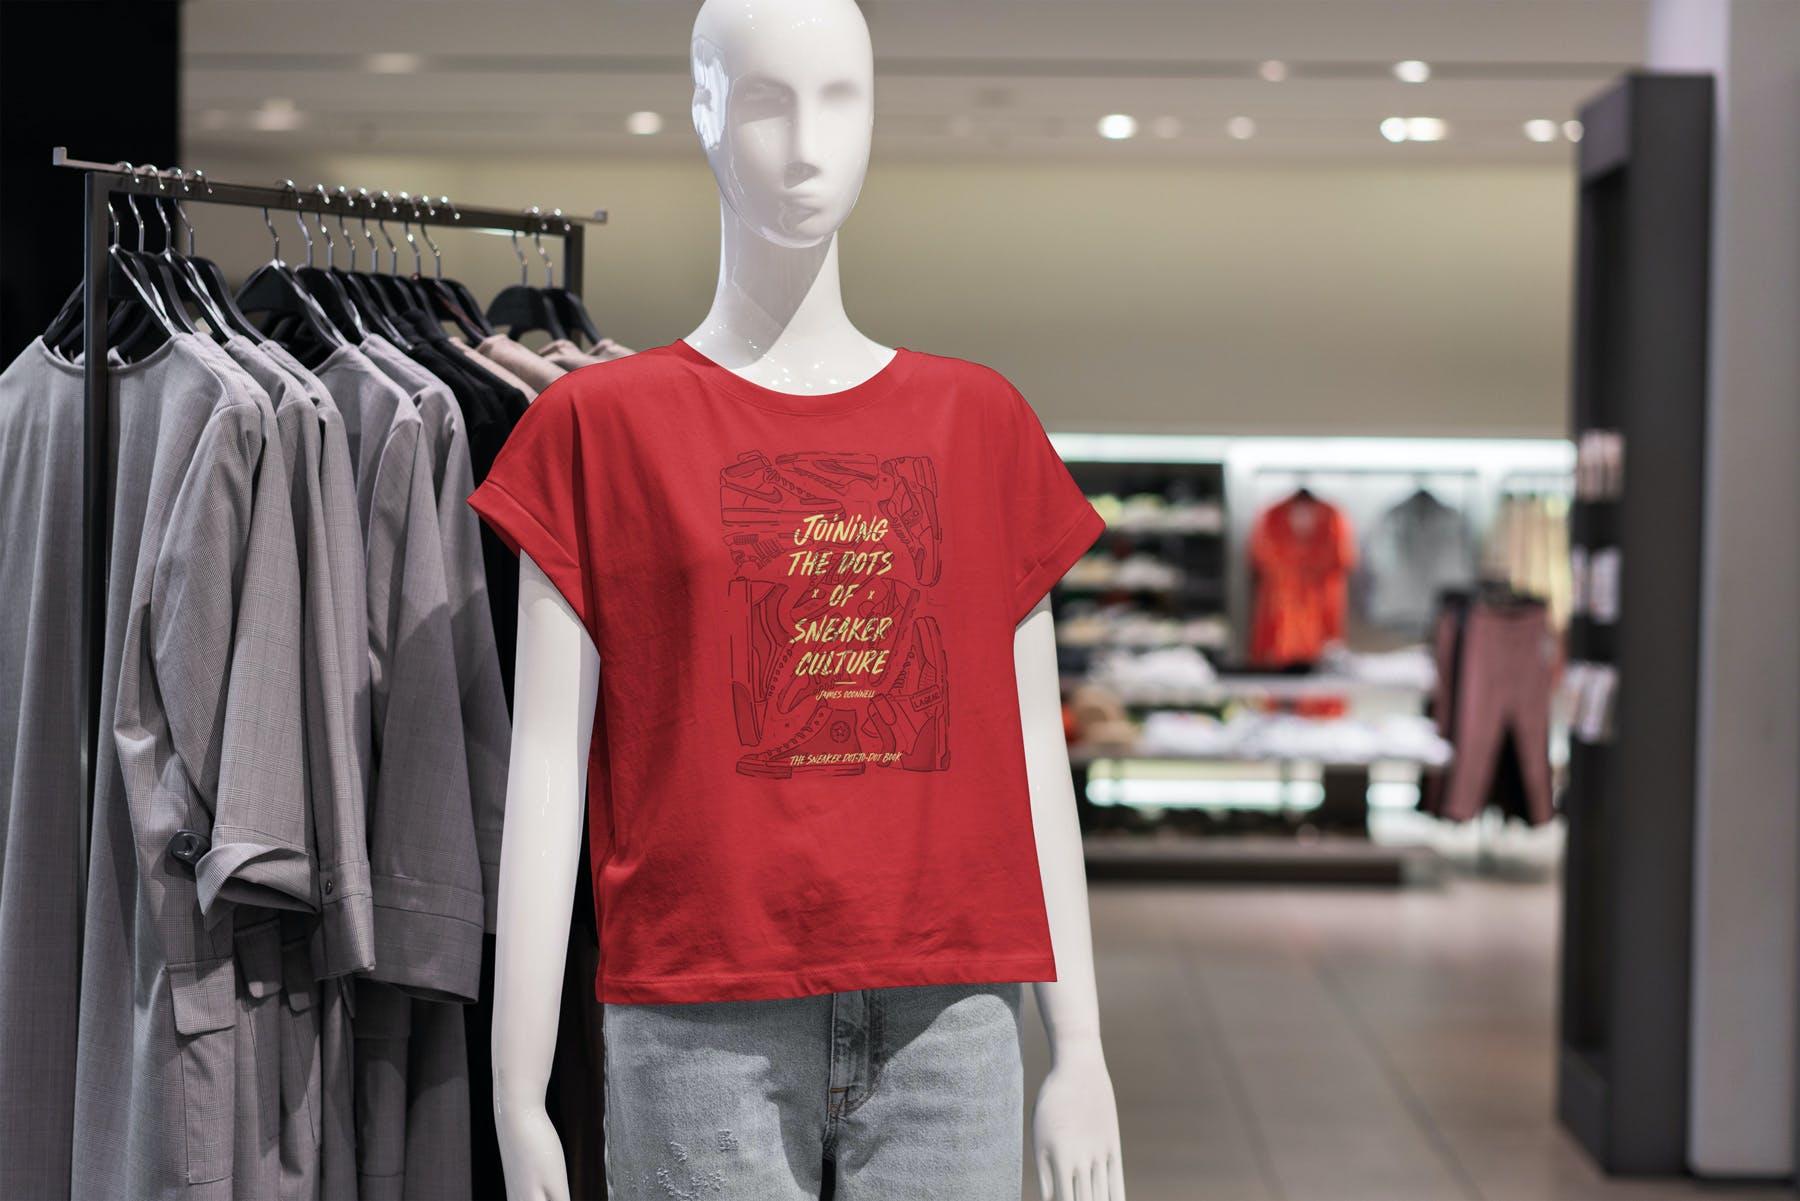 10款T恤半袖衫PSD样机模板 T-Shirt Shopping Mockup Vol.2插图(8)